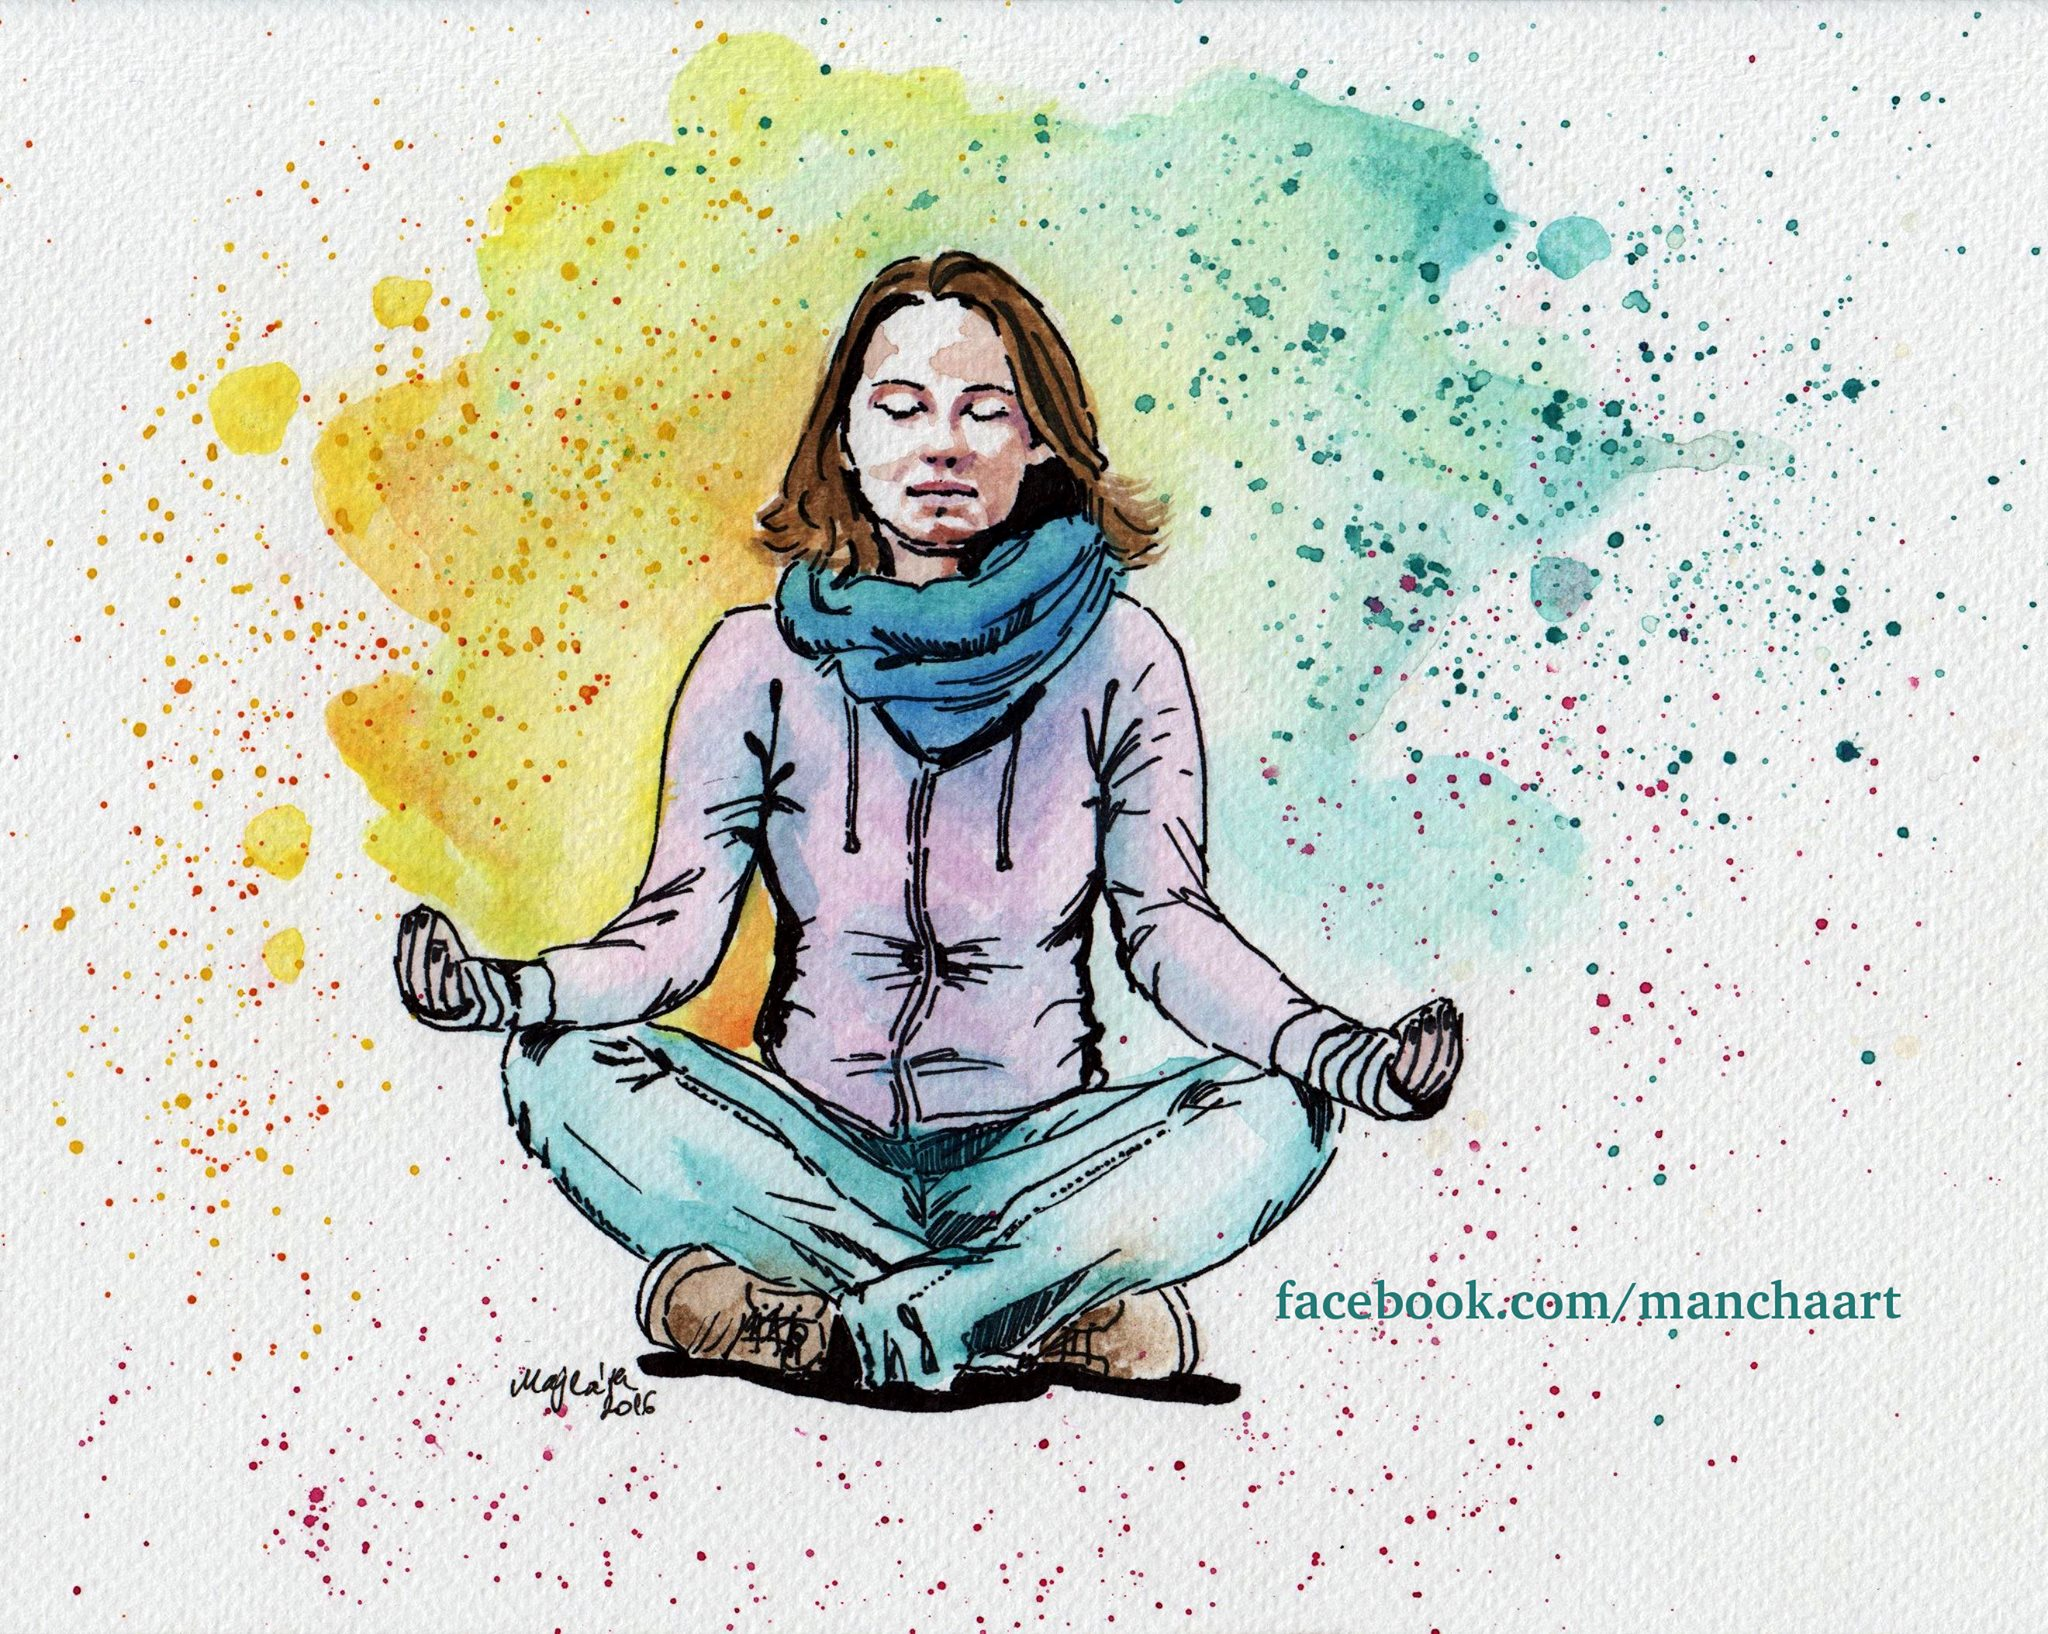 jógaoktató, jógaoktatóképzés, jógaoktató mentor, mentorprogram